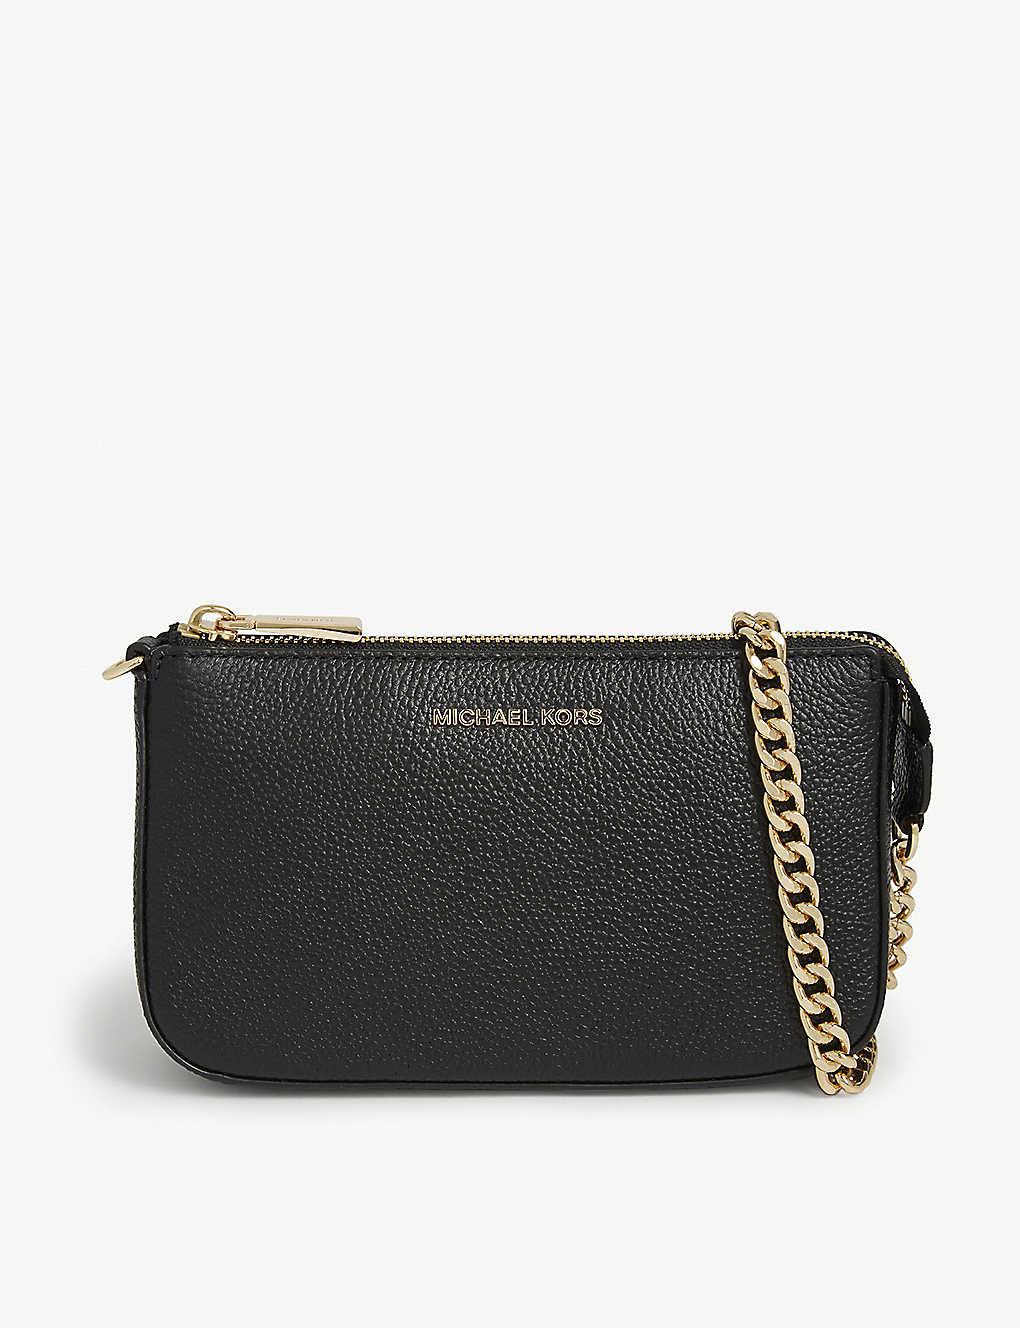 c3bcb7202b01ae MICHAEL MICHAEL KORS - Textured leather chain wallet | Selfridges.com